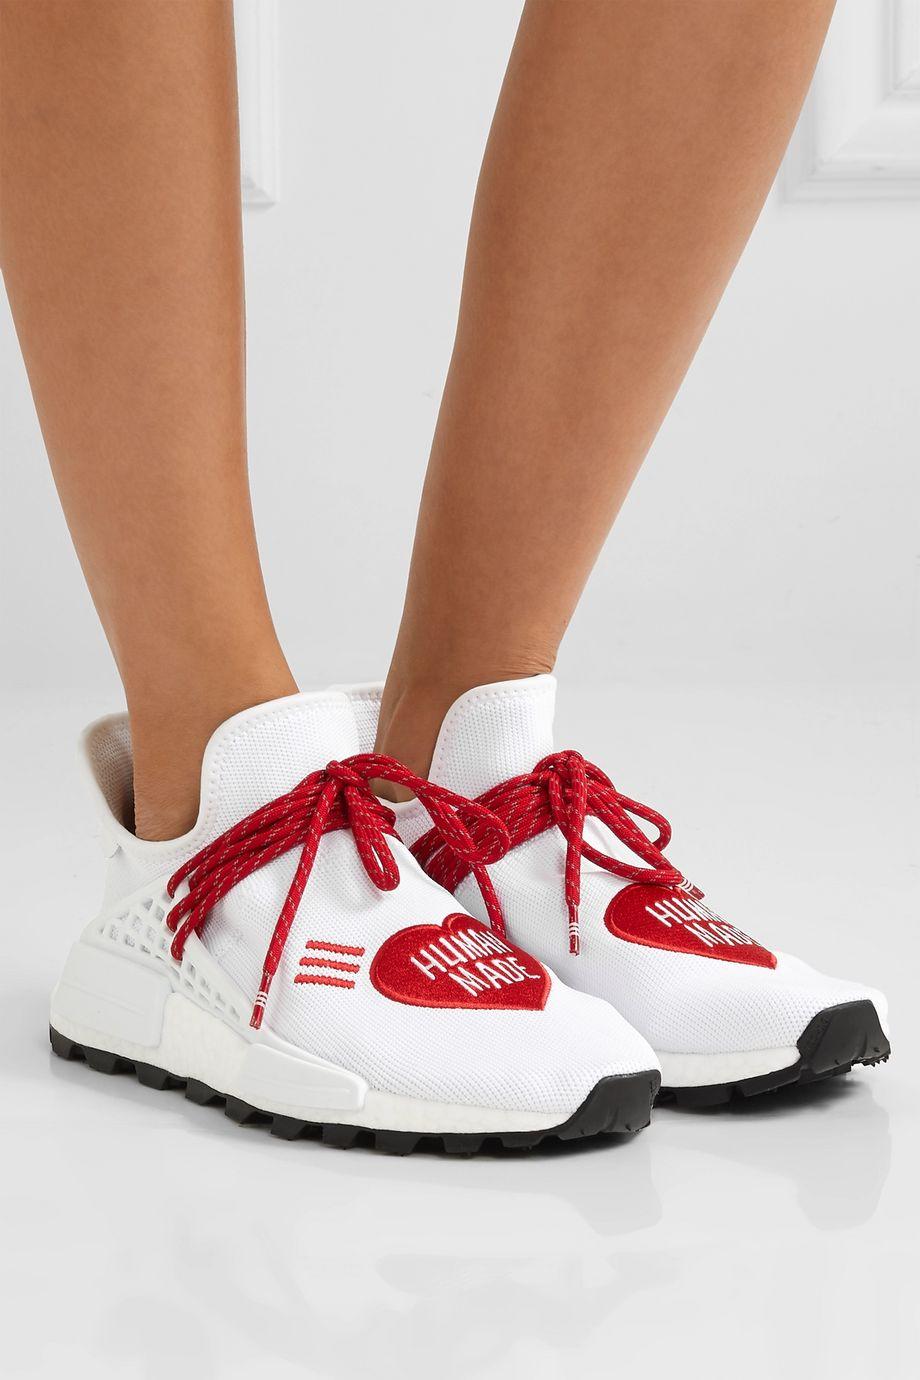 adidas Originals + Pharrell Williams + HUMAN MADE NMD Hu appliquéd stretch-knit sneakers